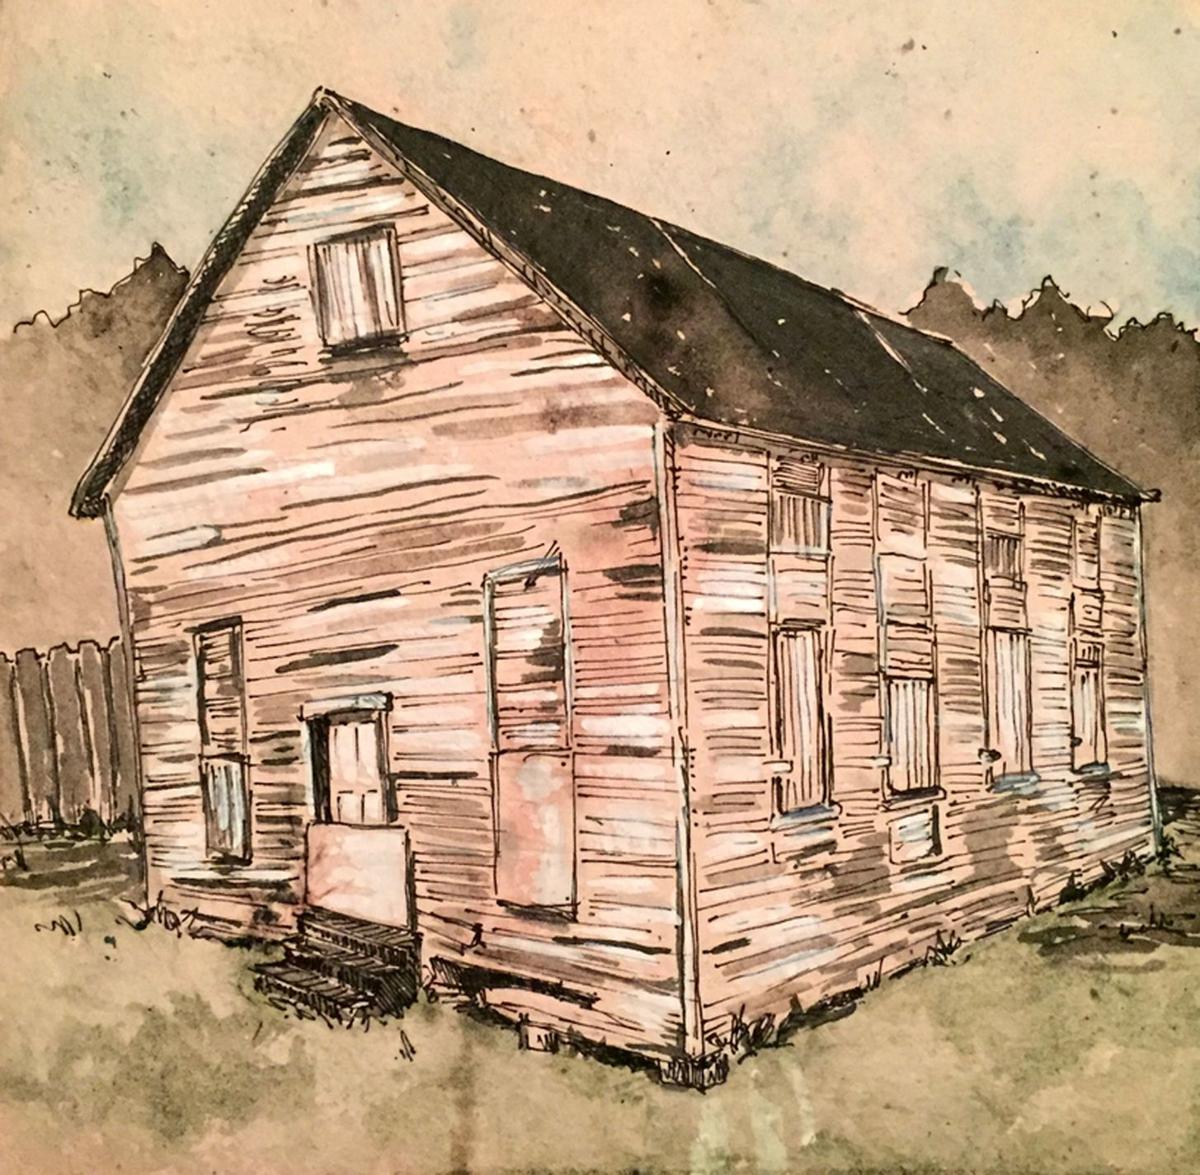 'Lodge' by Richard Curtis.